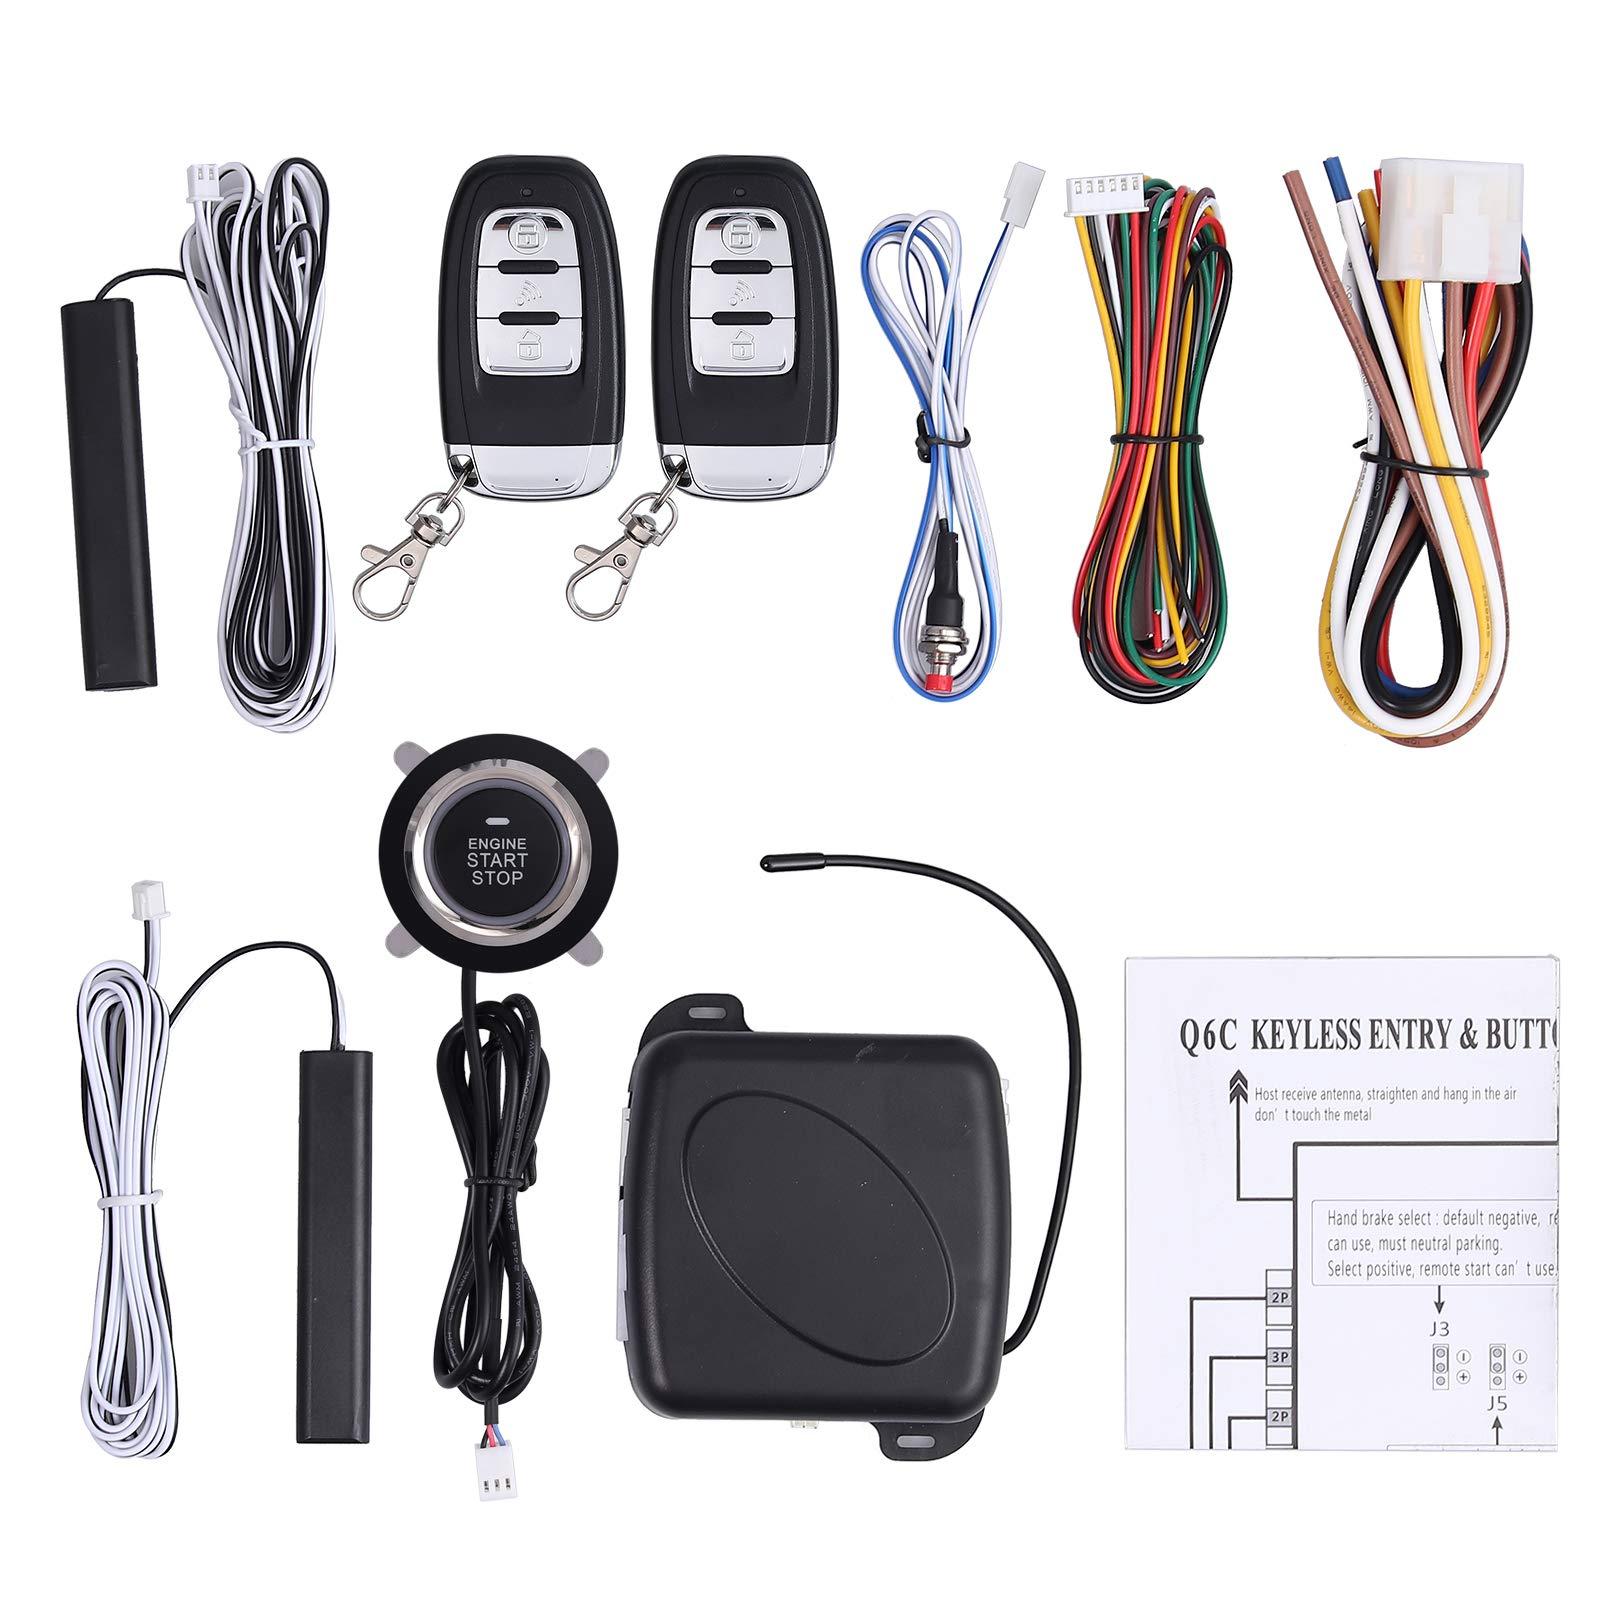 eSynic 12v Car Safety Alarm Start System Smart Keyless Entry Ignition Push Button Starter Car Intelligent PKE Anti-Theft Smart E Models Remote Control Sensor Alarm